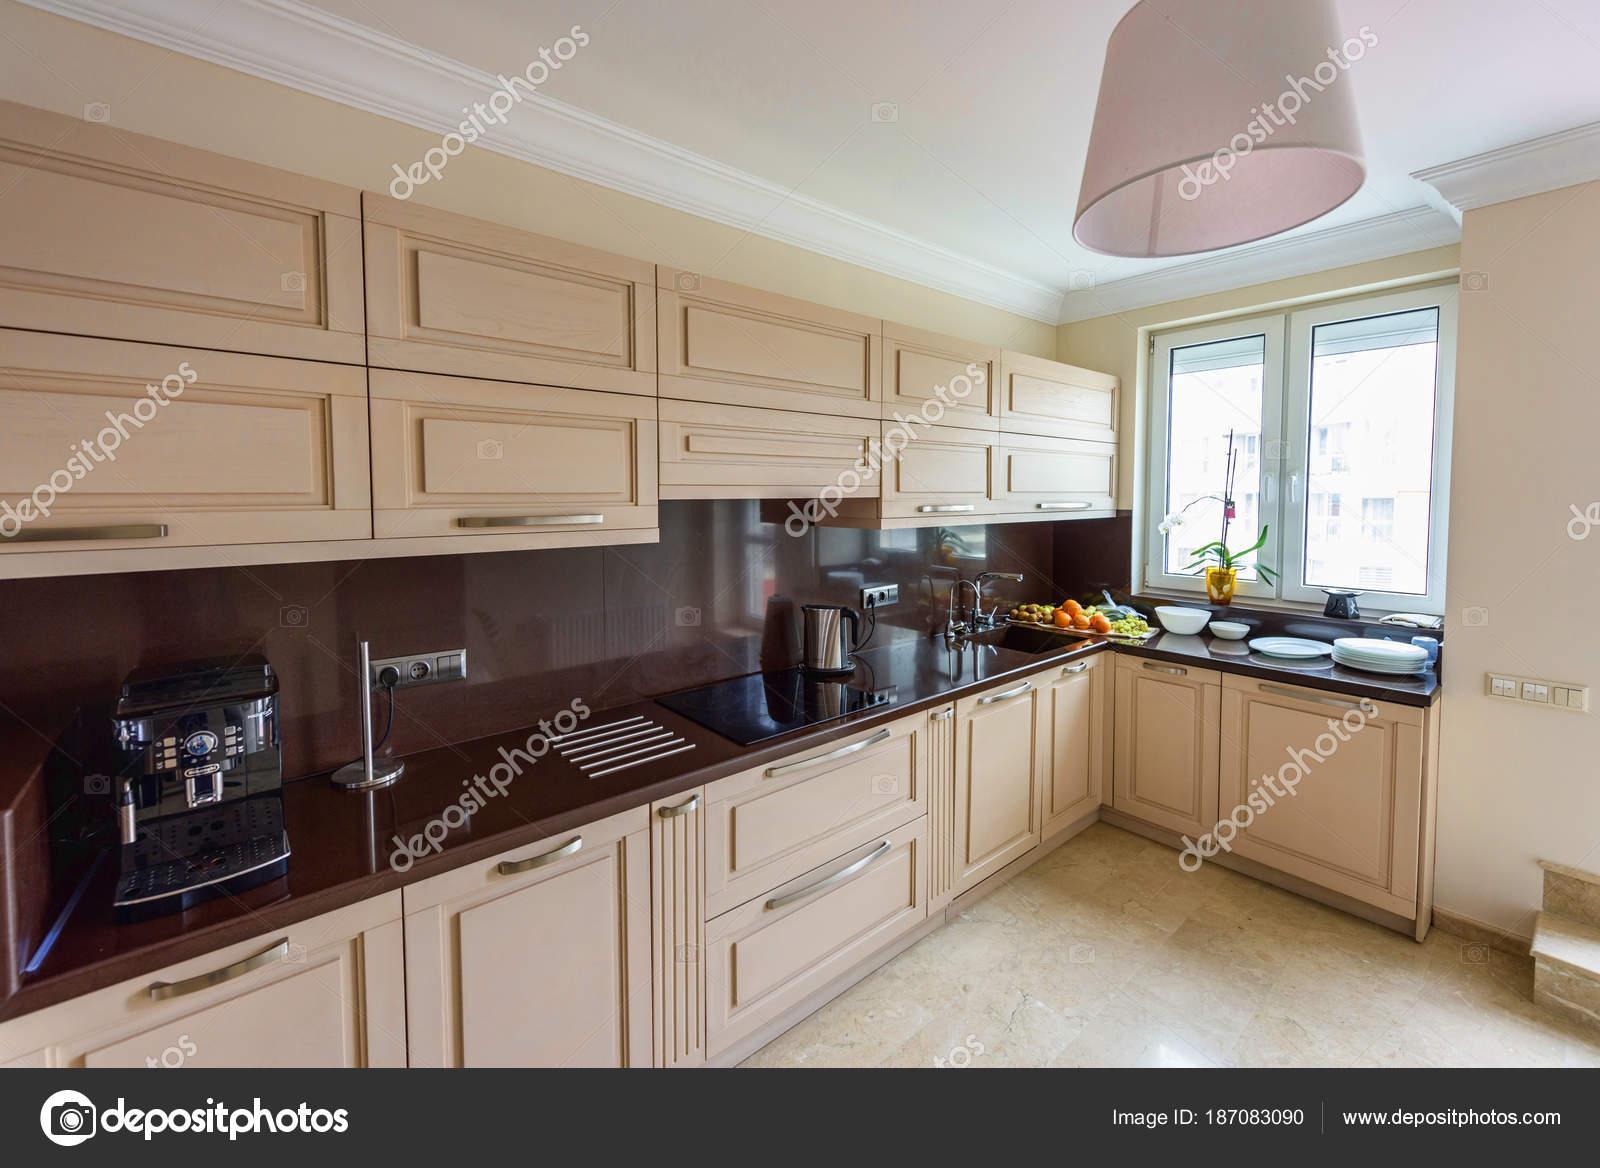 Moderne Keuken Ontwerpen : Moderne keuken interieur. appartement ontwerp groothoek foto